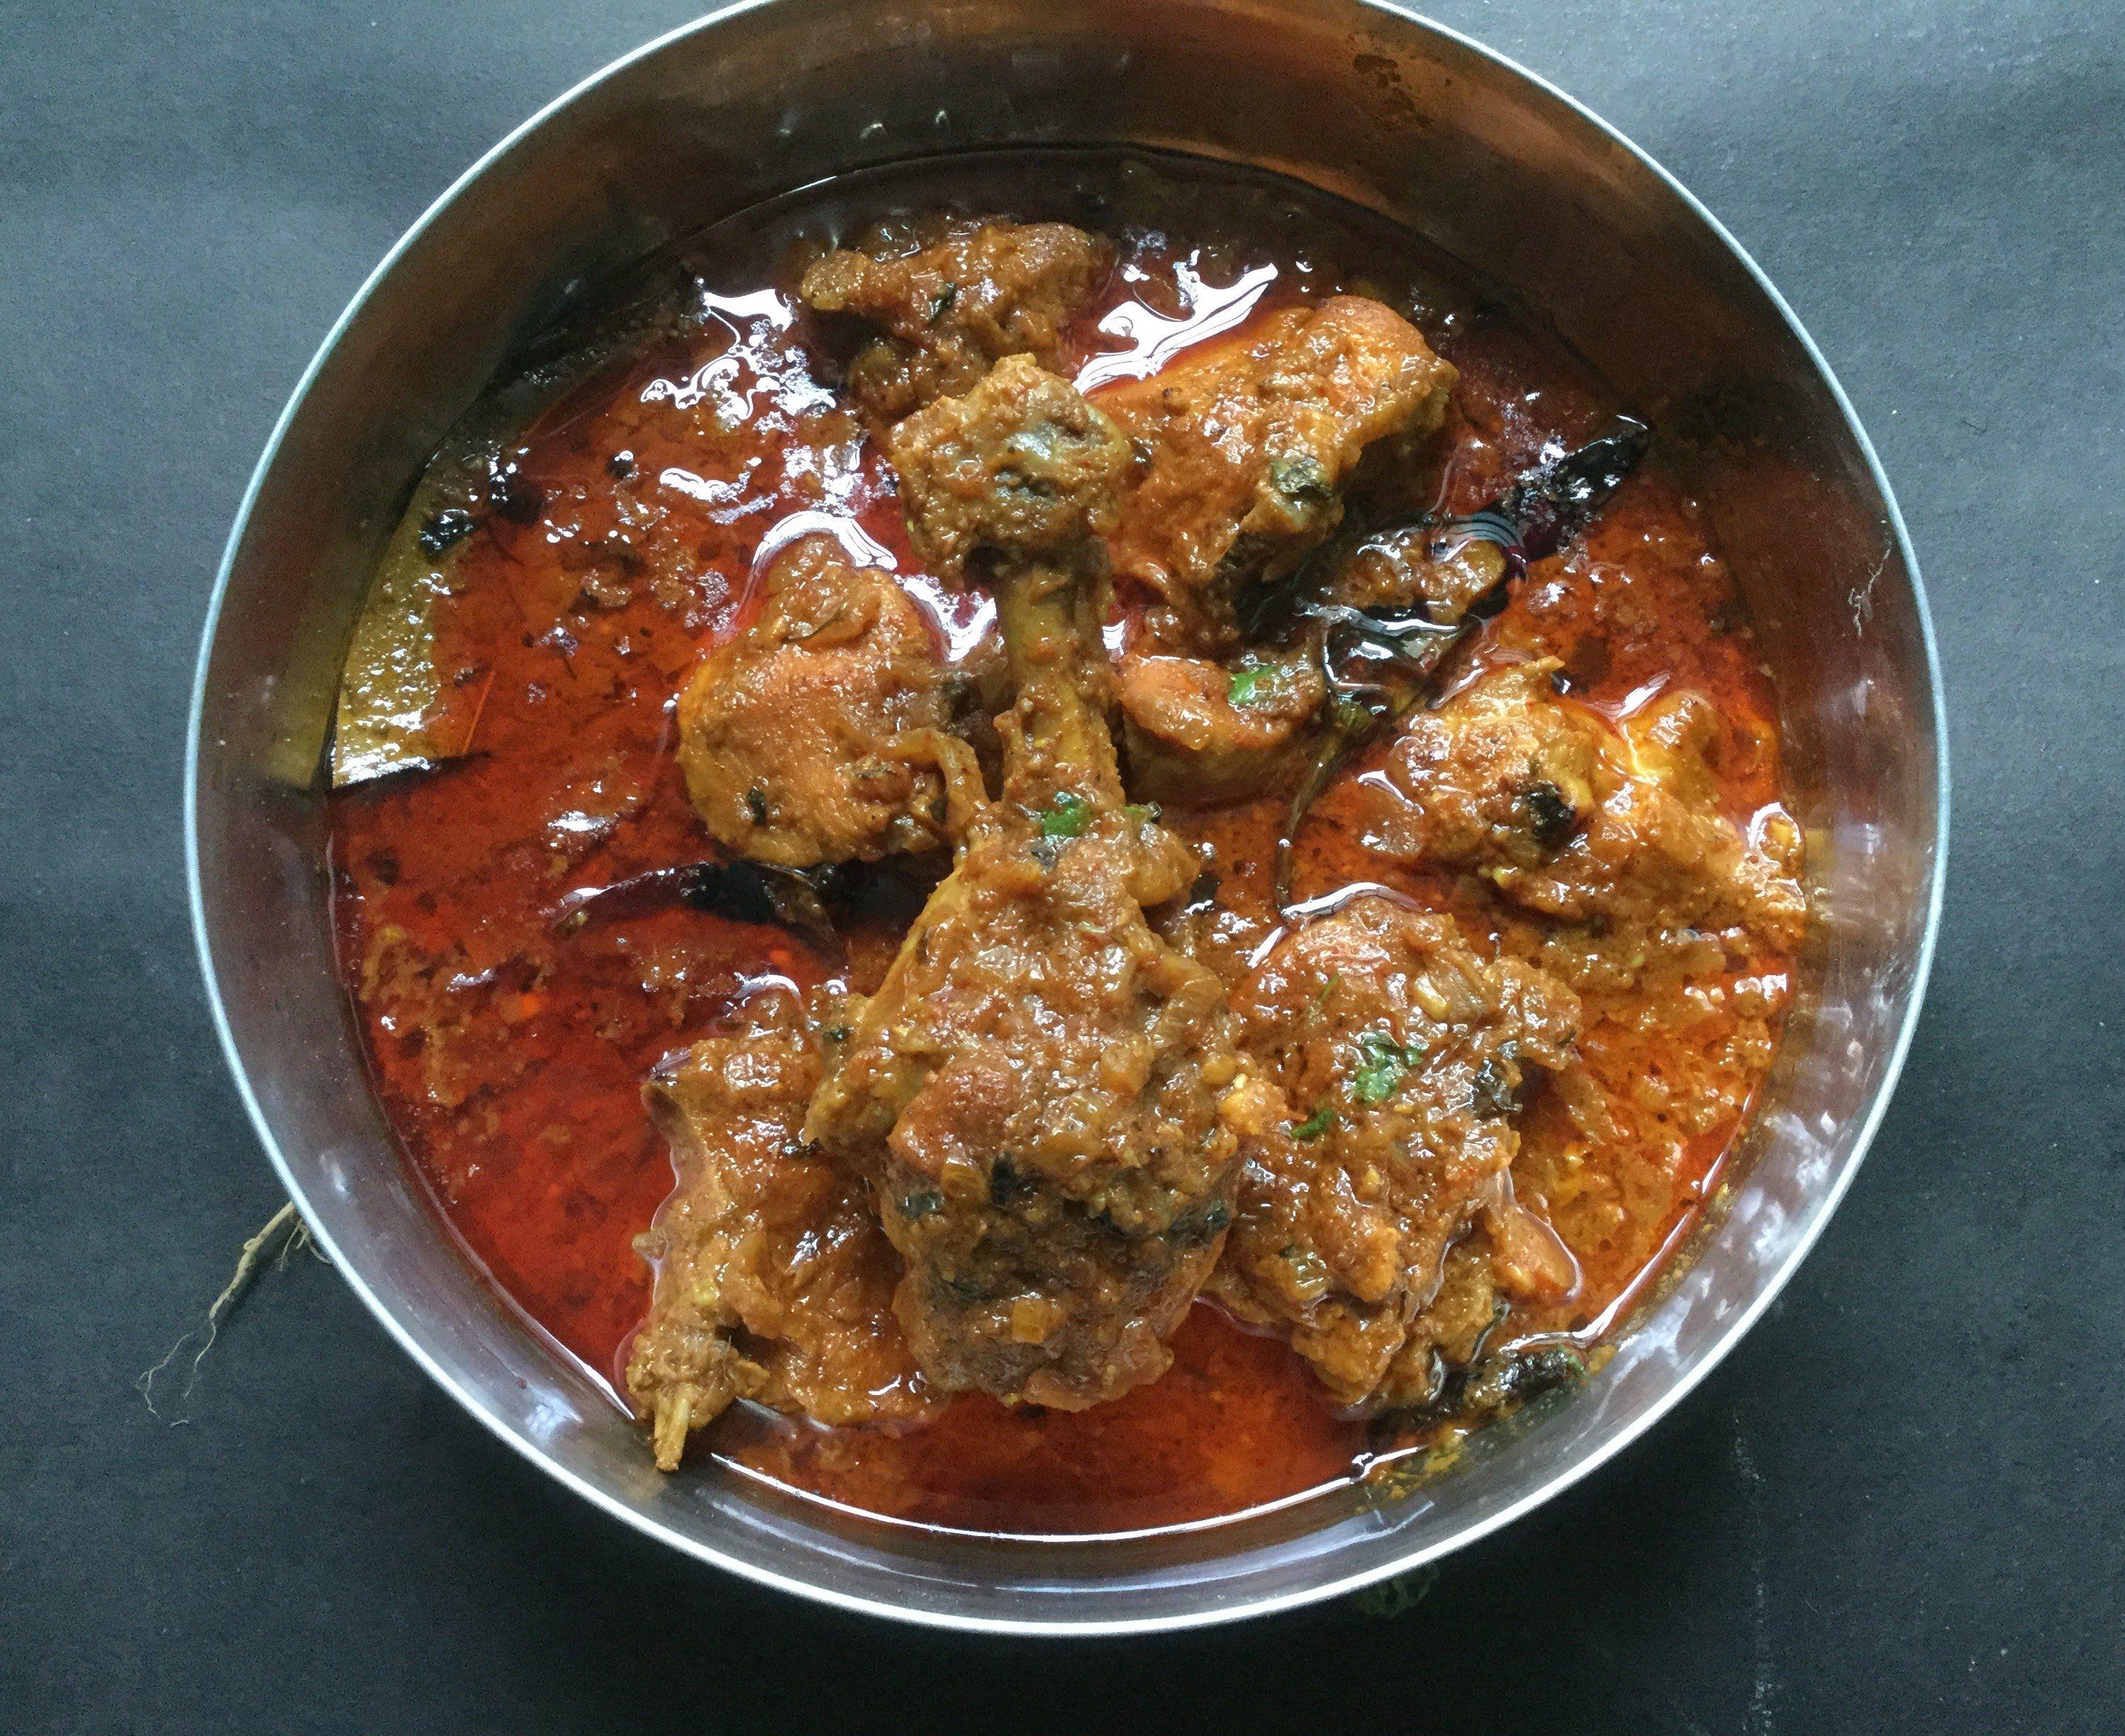 Dhaba style chicken curry indian desi chicken curry recipe dhaba style chicken curry indian desi chicken curry recipe forumfinder Image collections